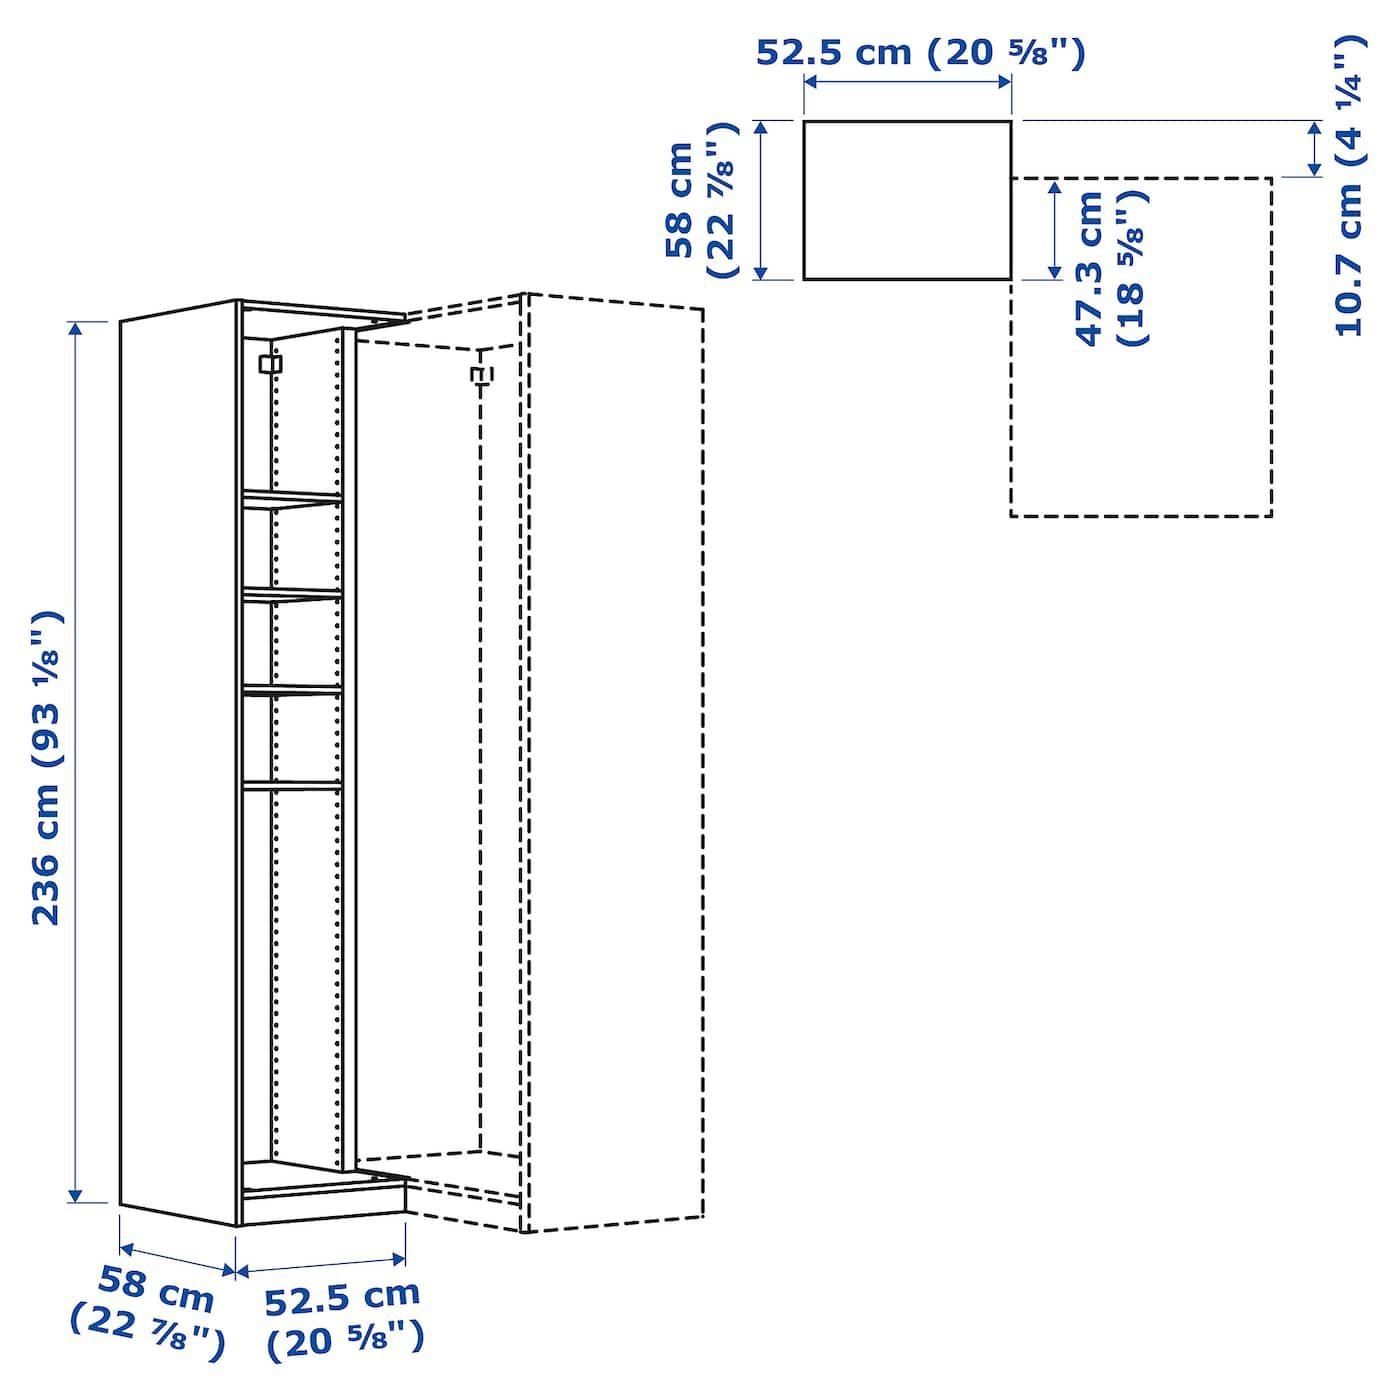 PAX Elemento angolare supplem/4 ripiani effetto frassino